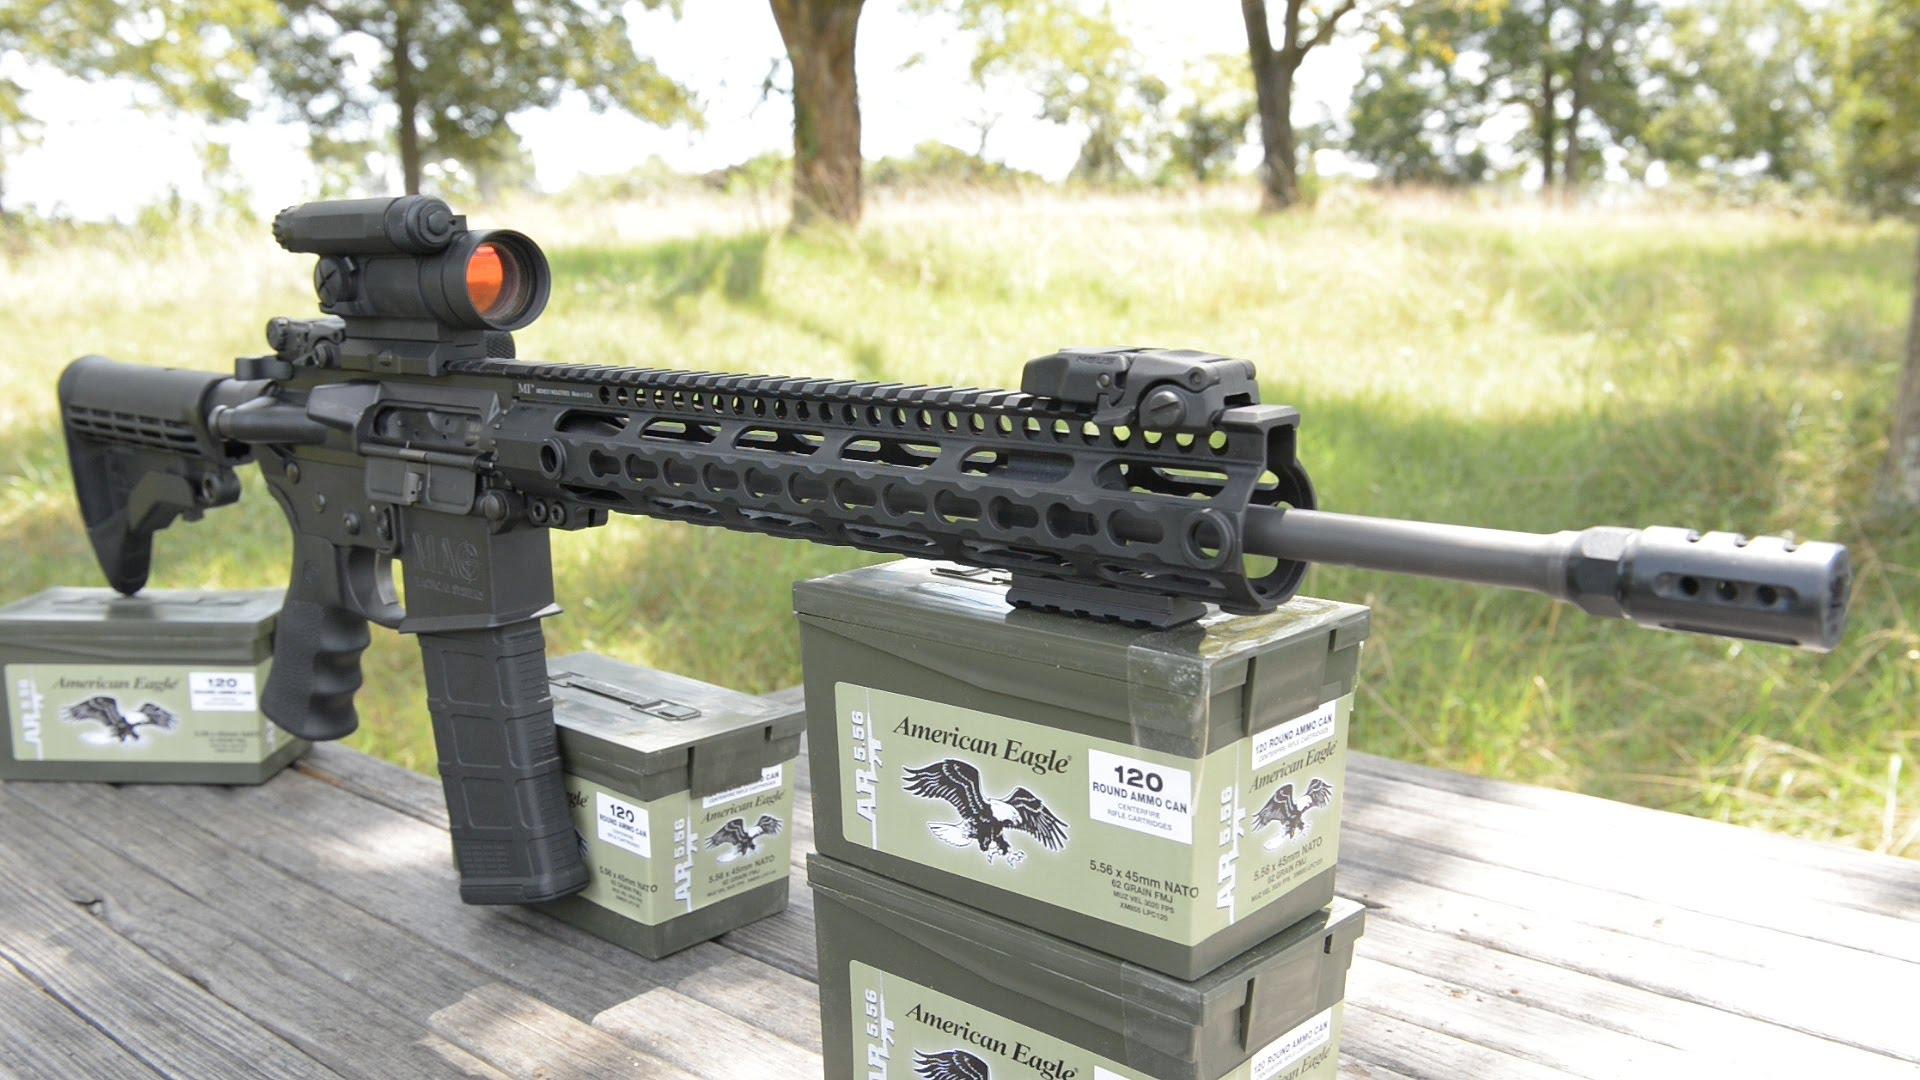 MAG Tactical AIR 15 Recon